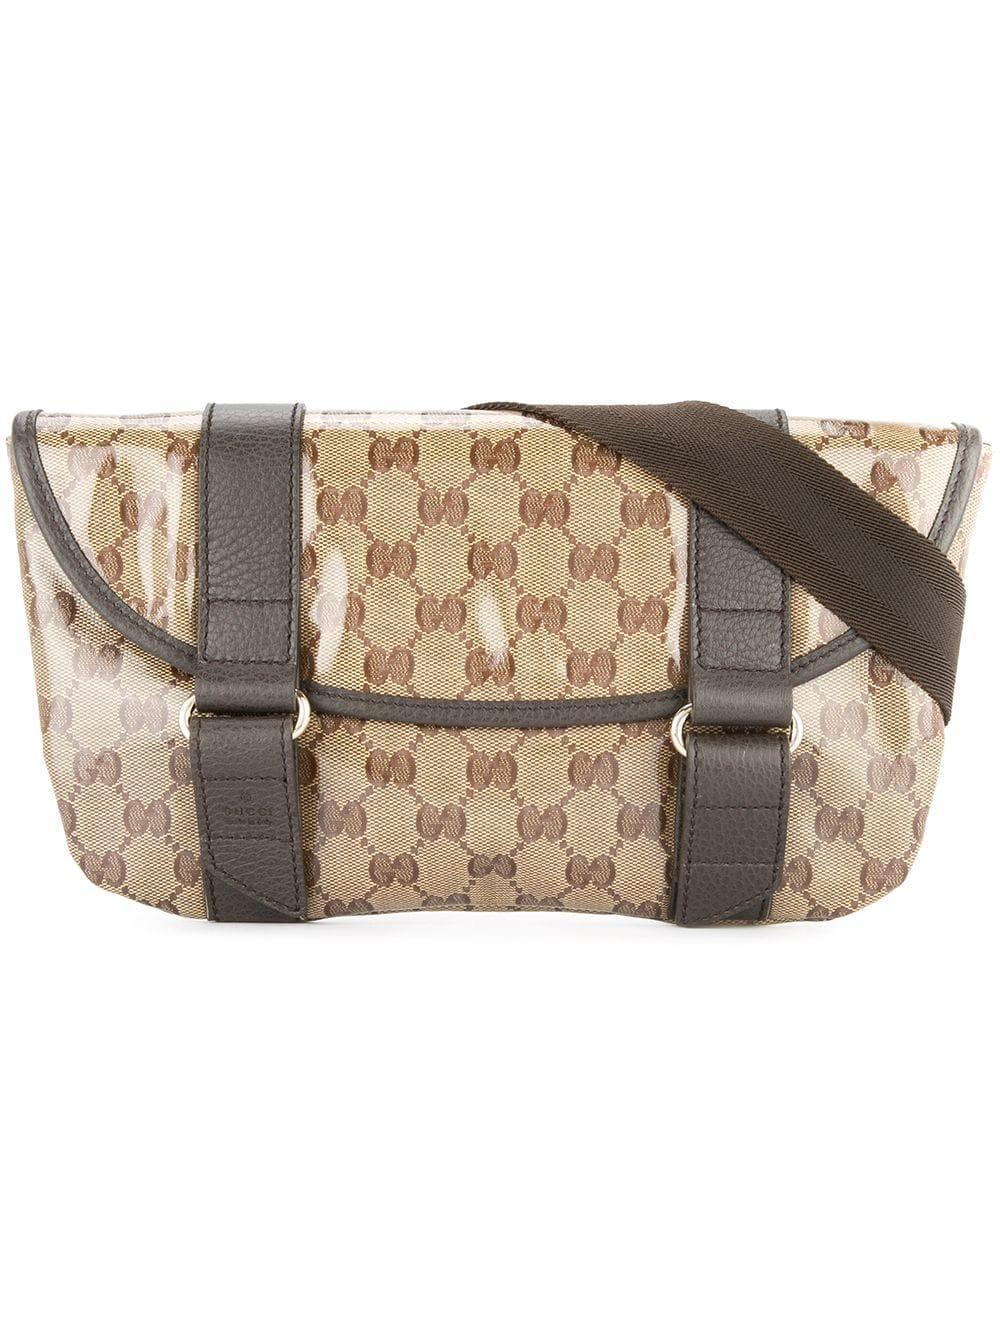 360b8212afc Gucci Gg Pattern Waist Bum Bag In Brown